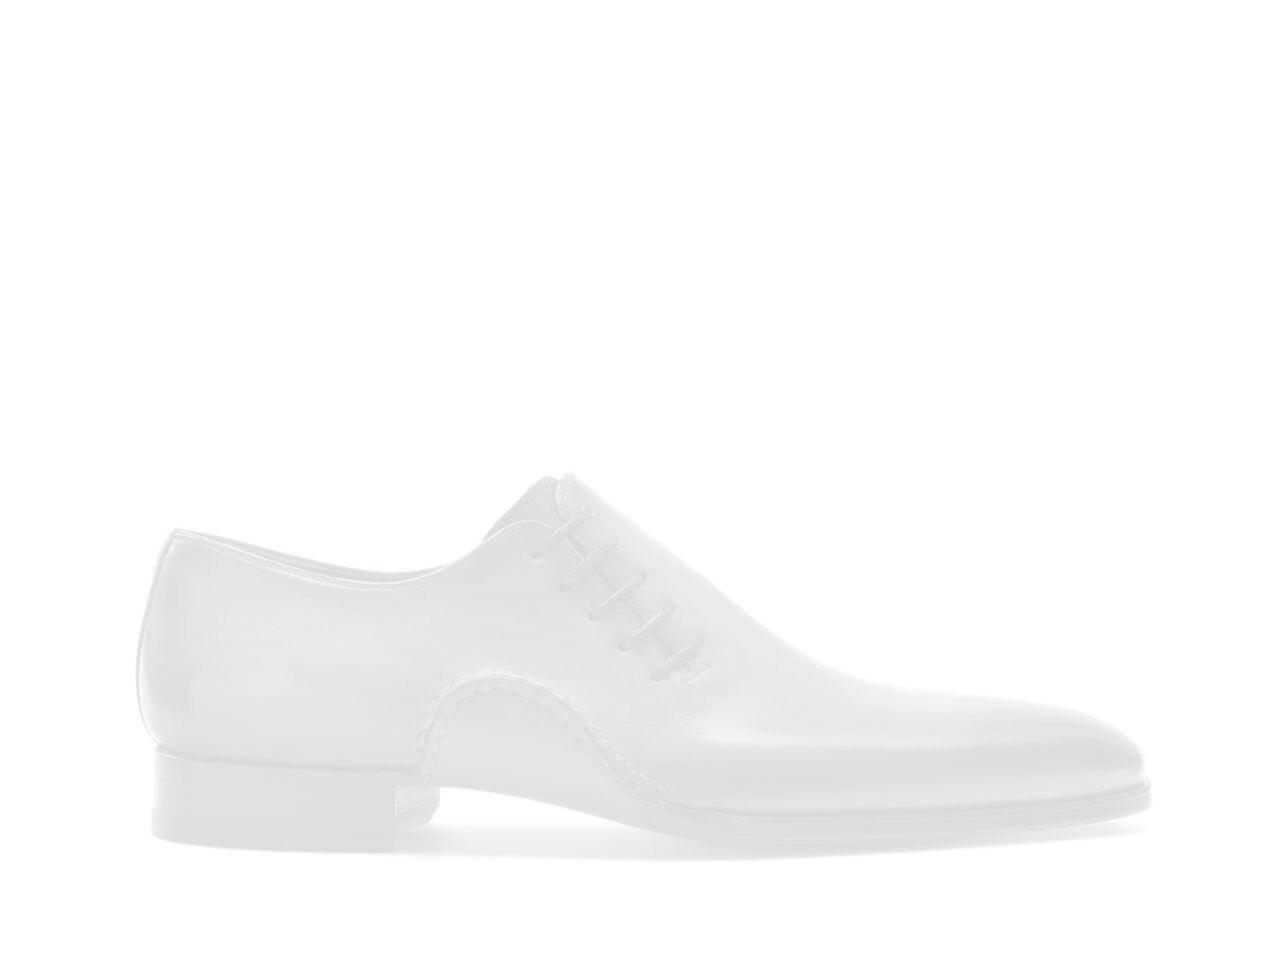 Pair of the Magnanni Cruz Grafito Men's Oxford Shoes